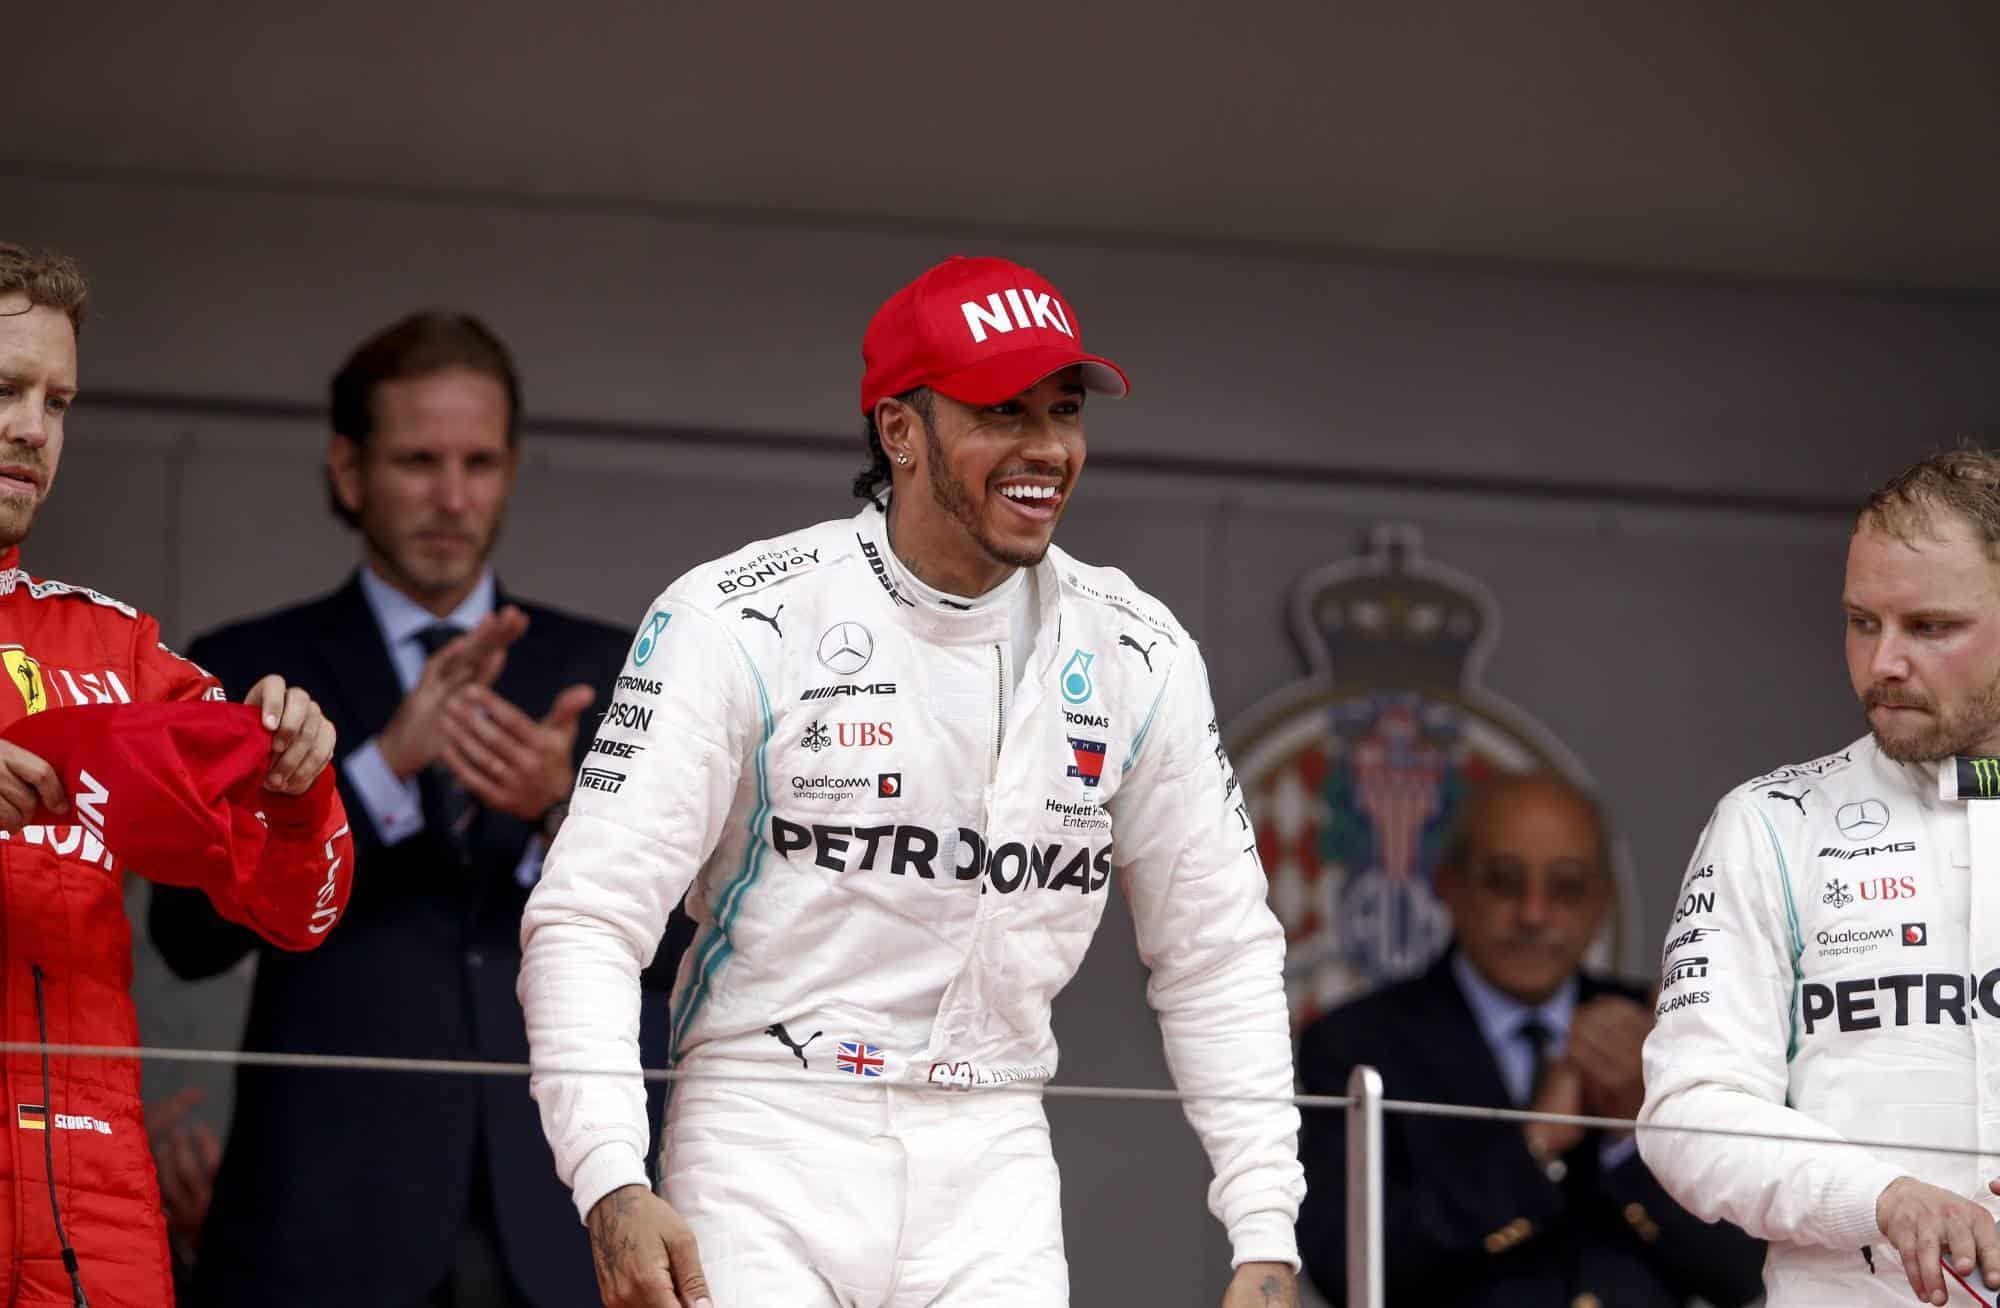 Hamilton wins Monaco GP F1 2019 podium Vettel Bottas Photo Daimler